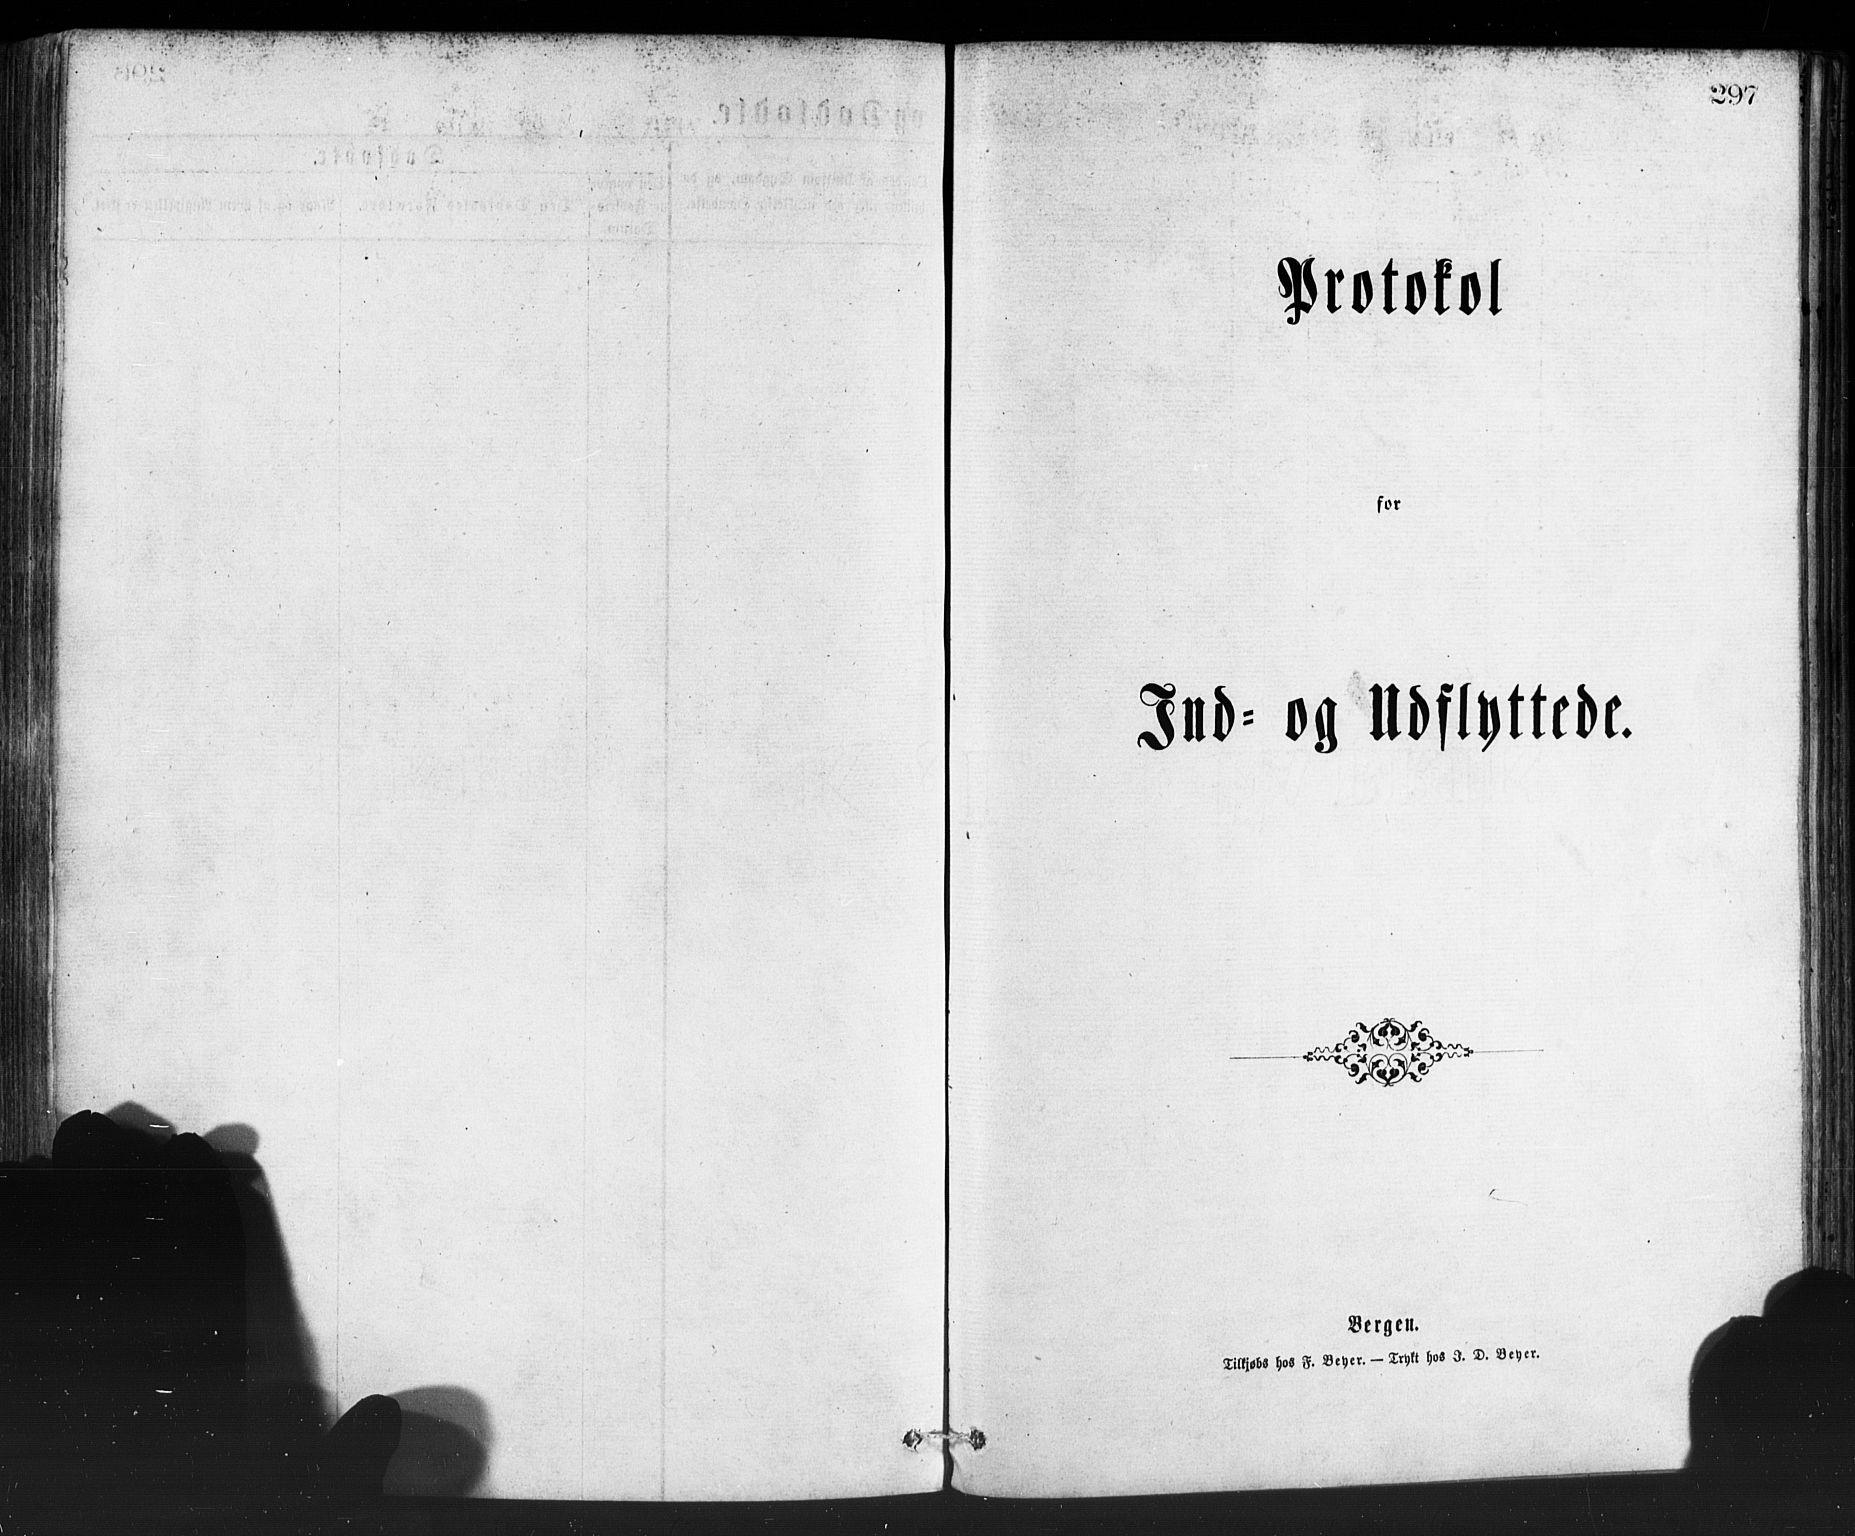 SAB, Manger sokneprestembete, H/Haa: Ministerialbok nr. A 8, 1871-1880, s. 297